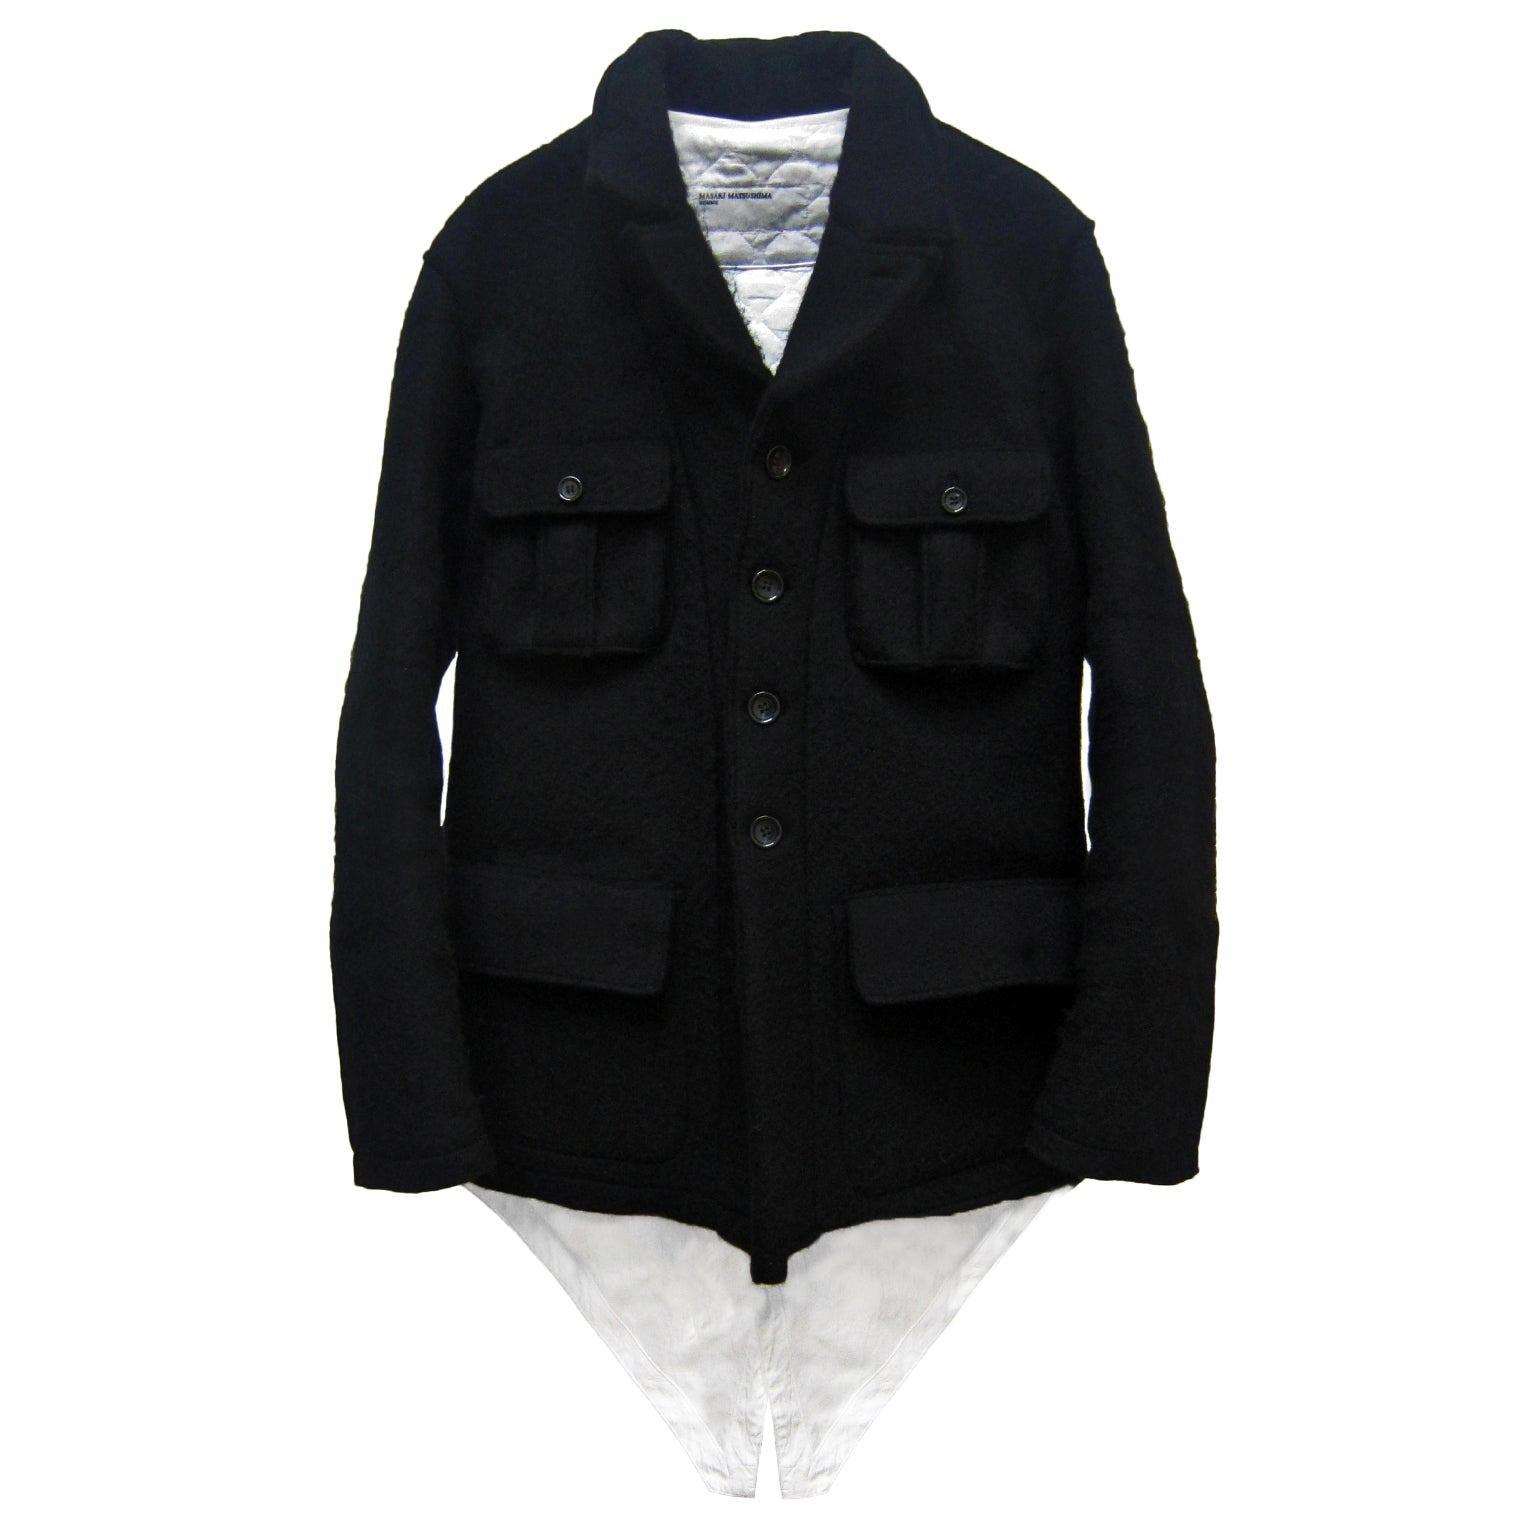 Masaki Matsushima Homme Heavy Wool Black Jacket Coat removable lining 1990s